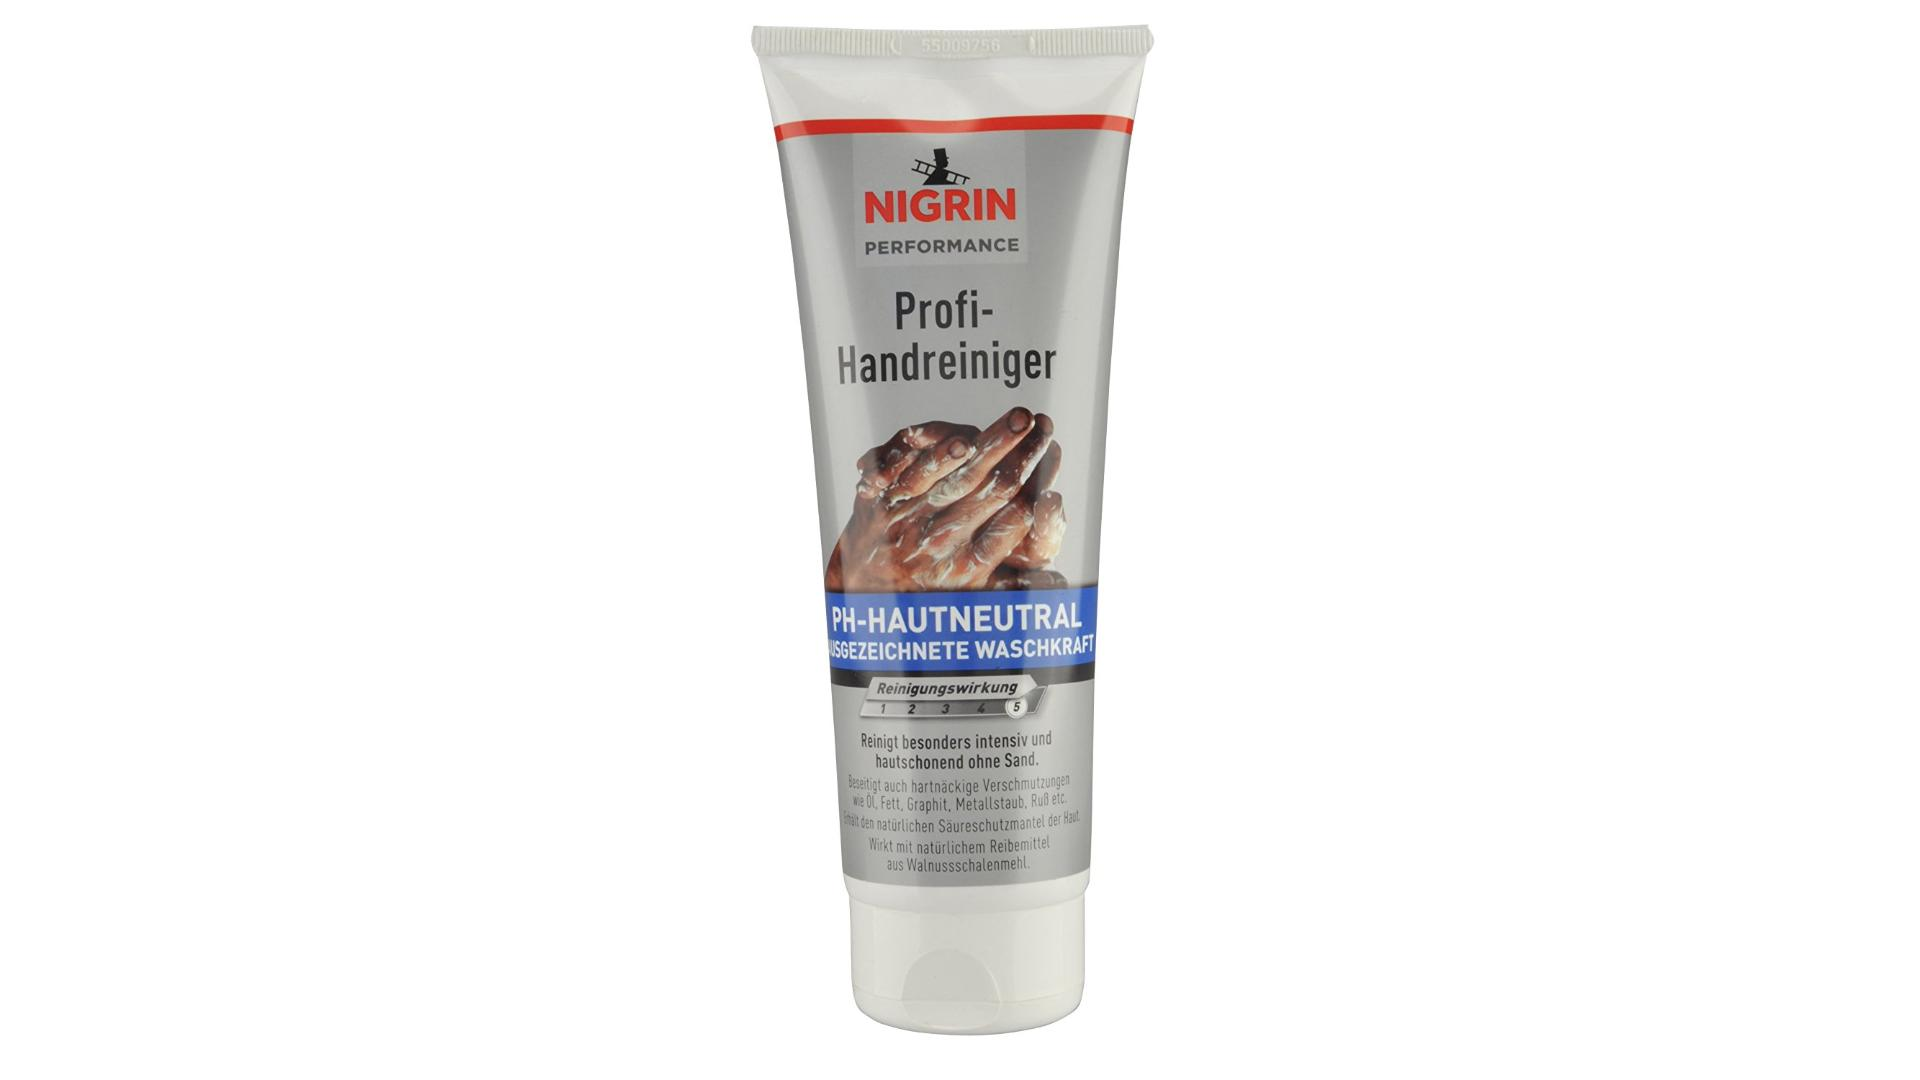 NIGRIN Professional Hand Wash 250ml